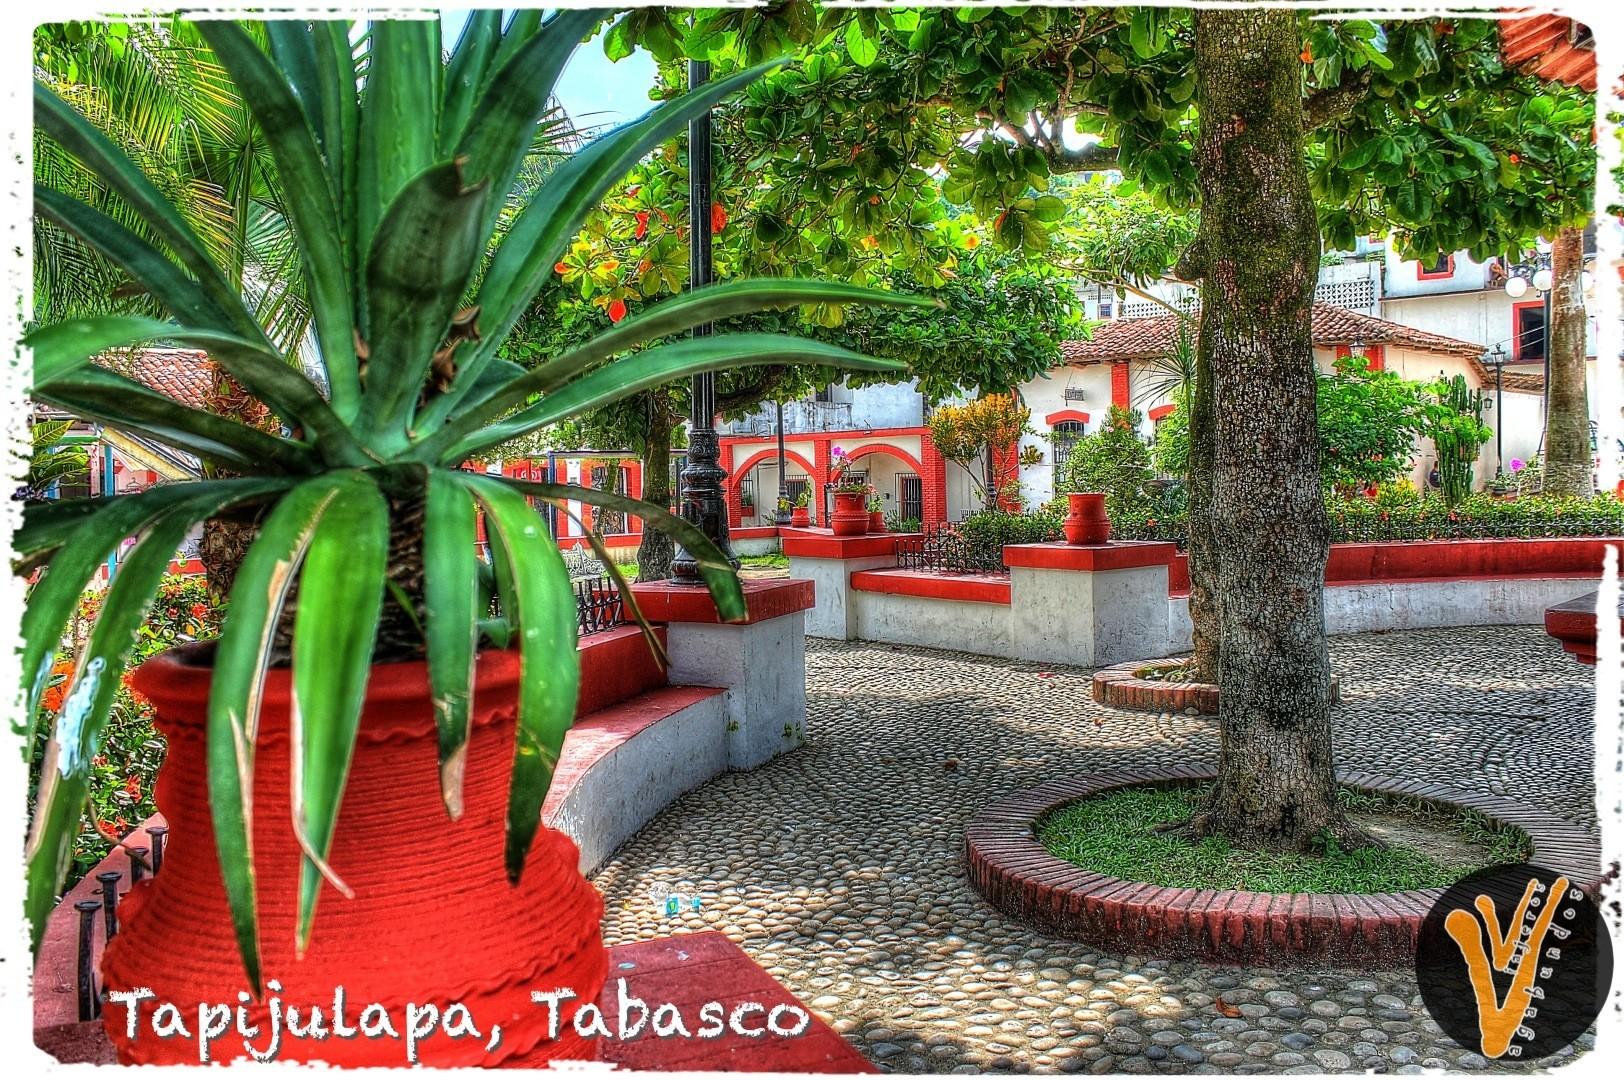 Plaza de Tapijulapa